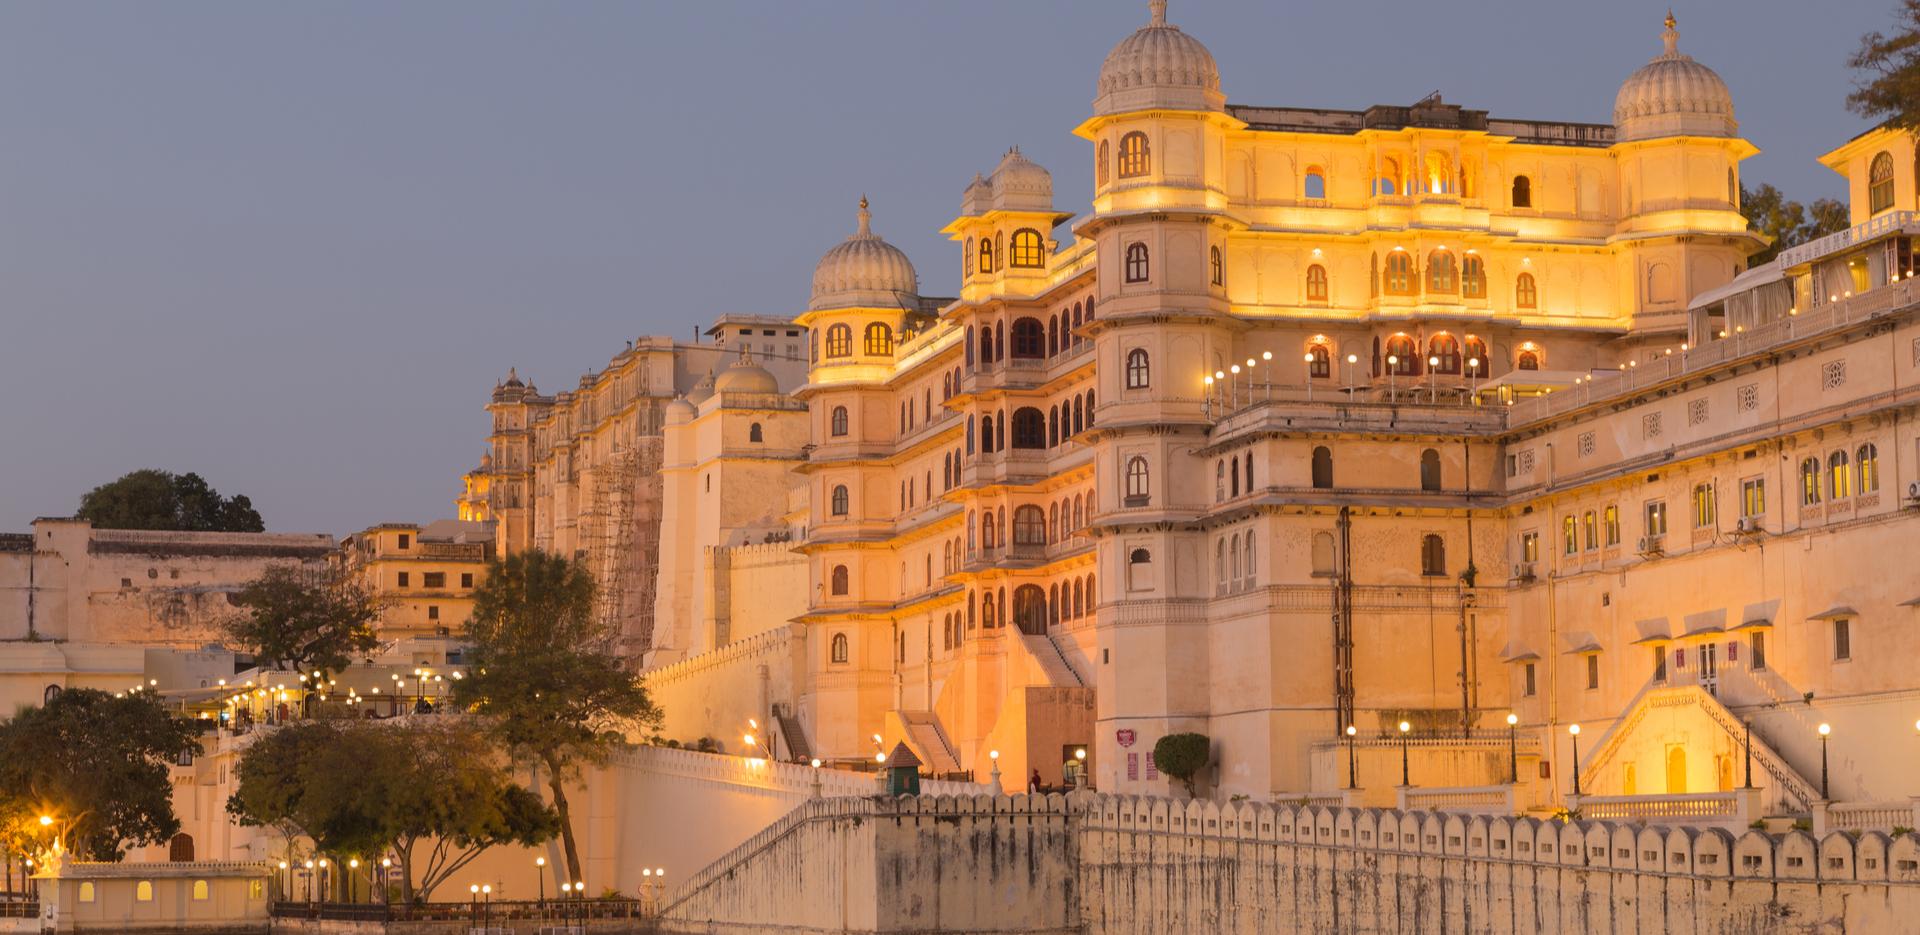 Udaipur City, Rajasthan